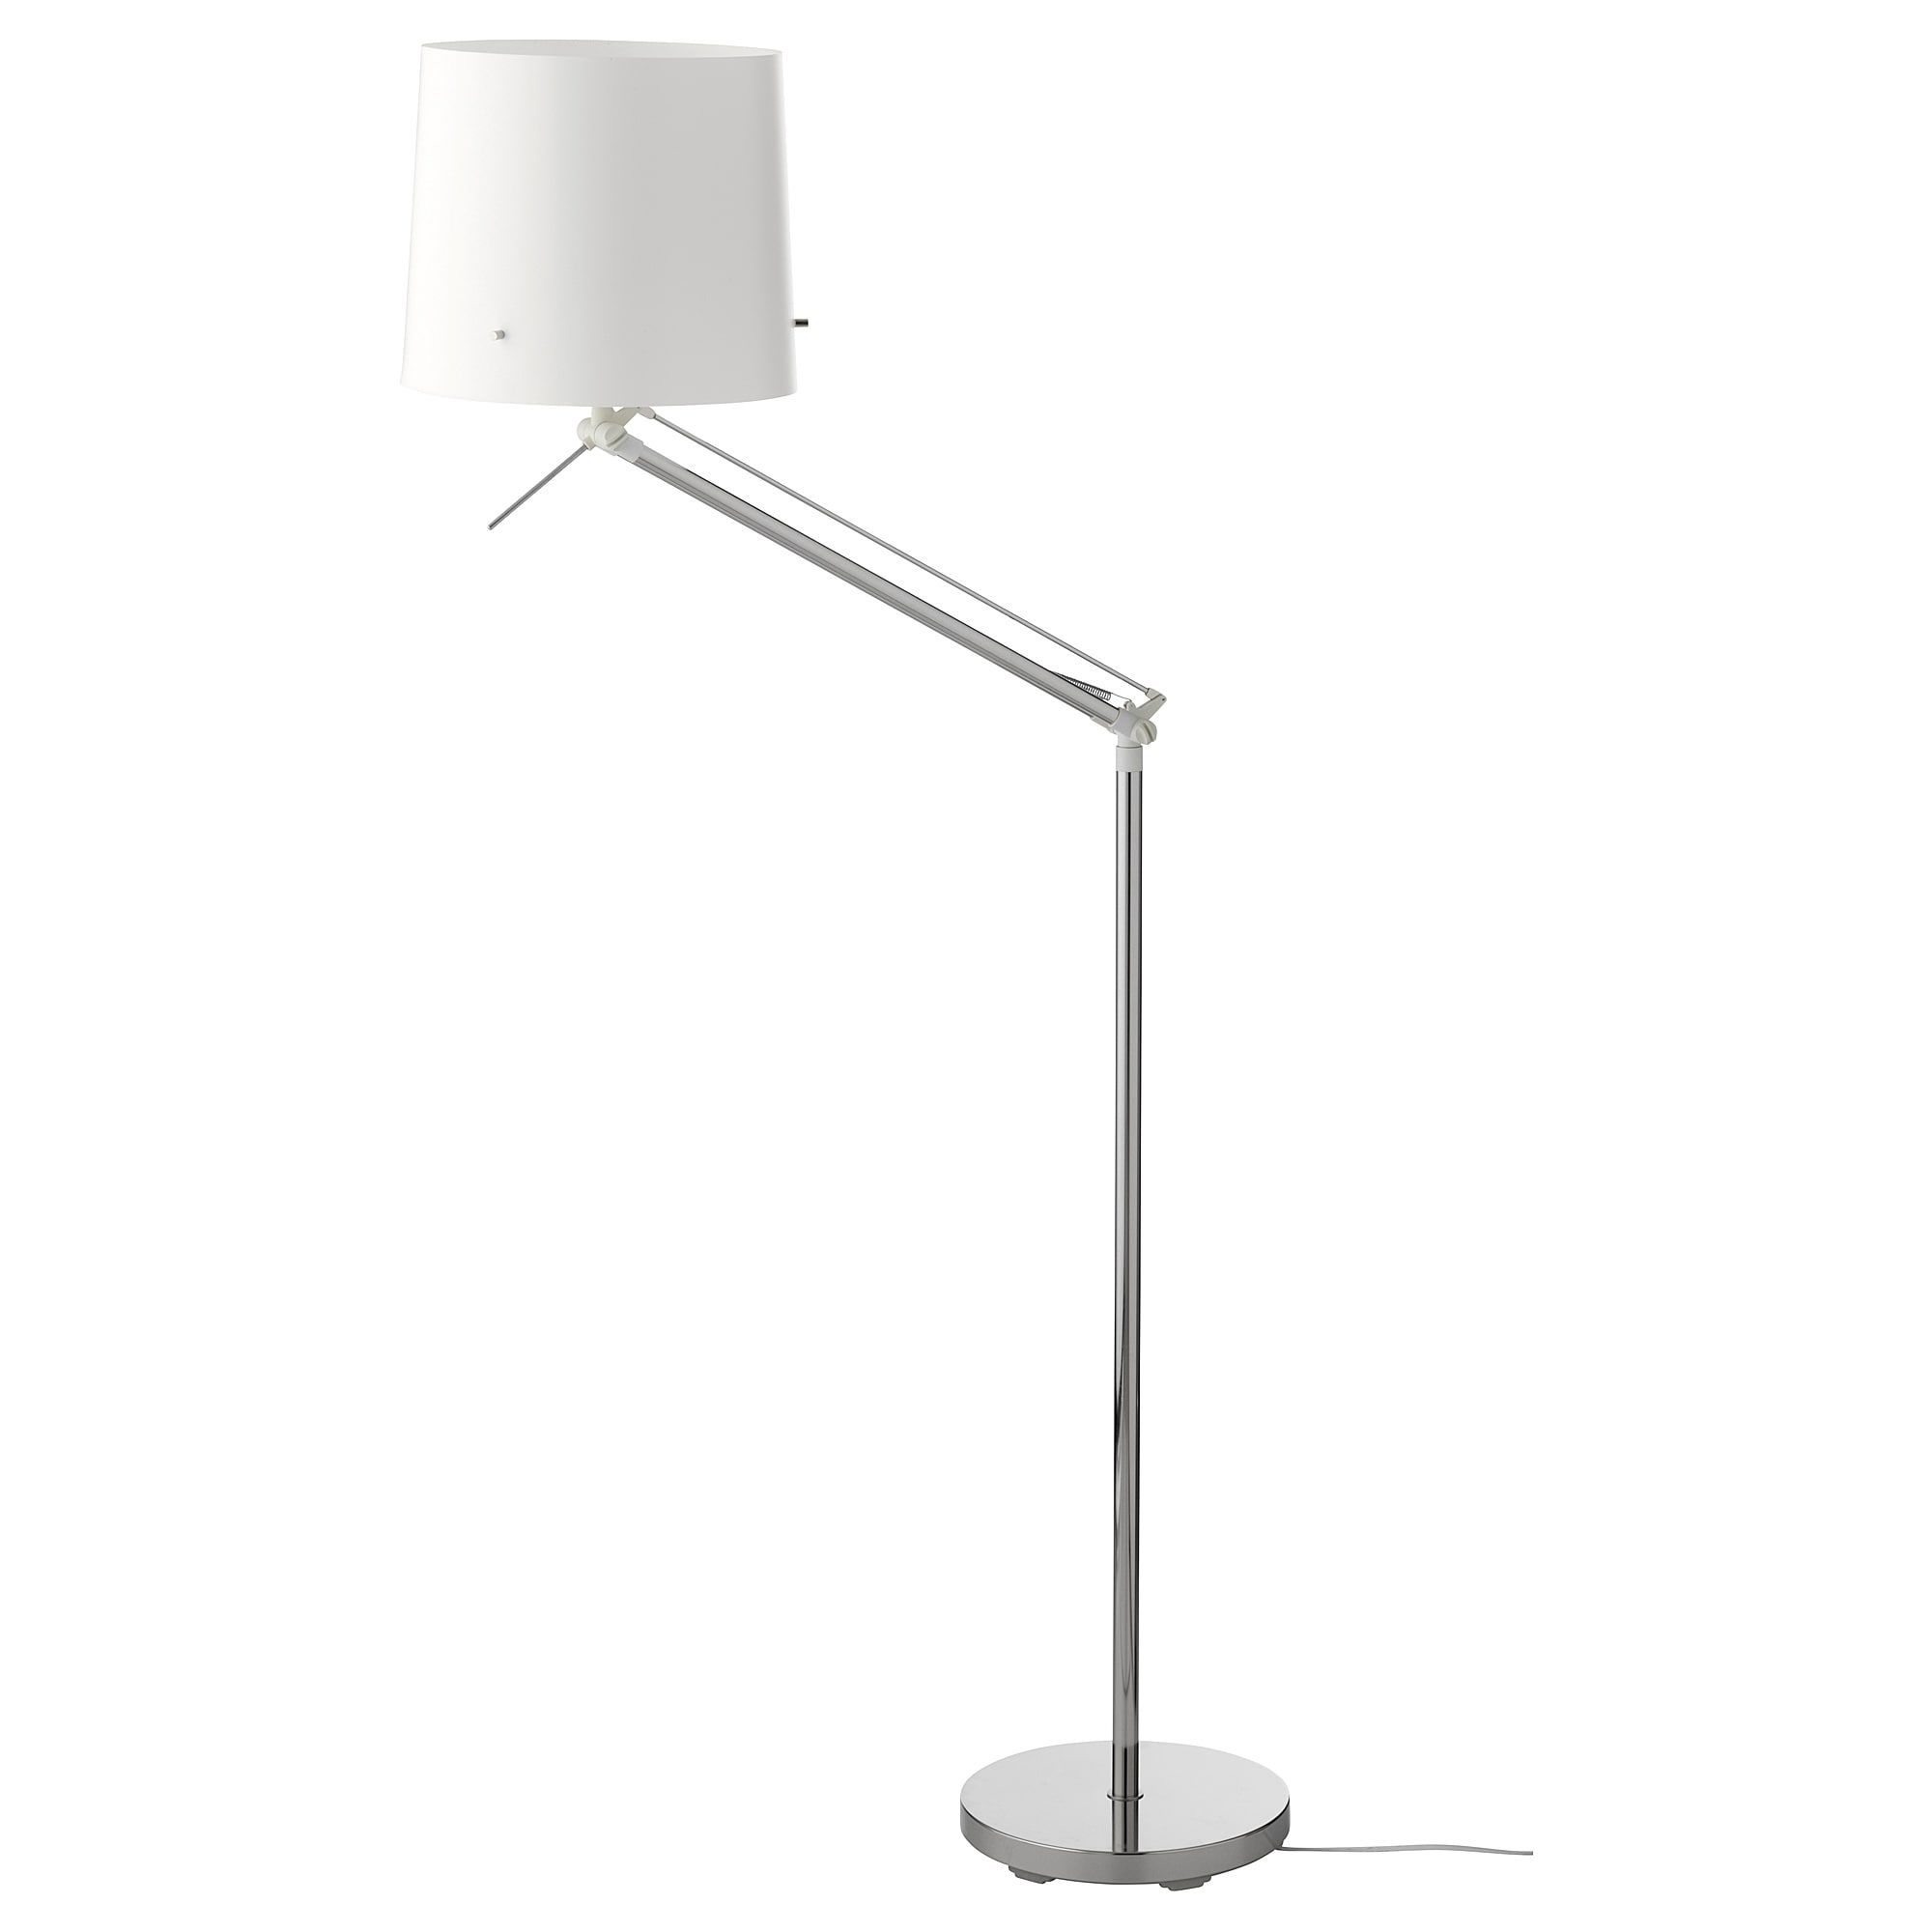 Furniture And Home Furnishings Lampadaire Liseuse Lampadaire Et Lampe De Lecture